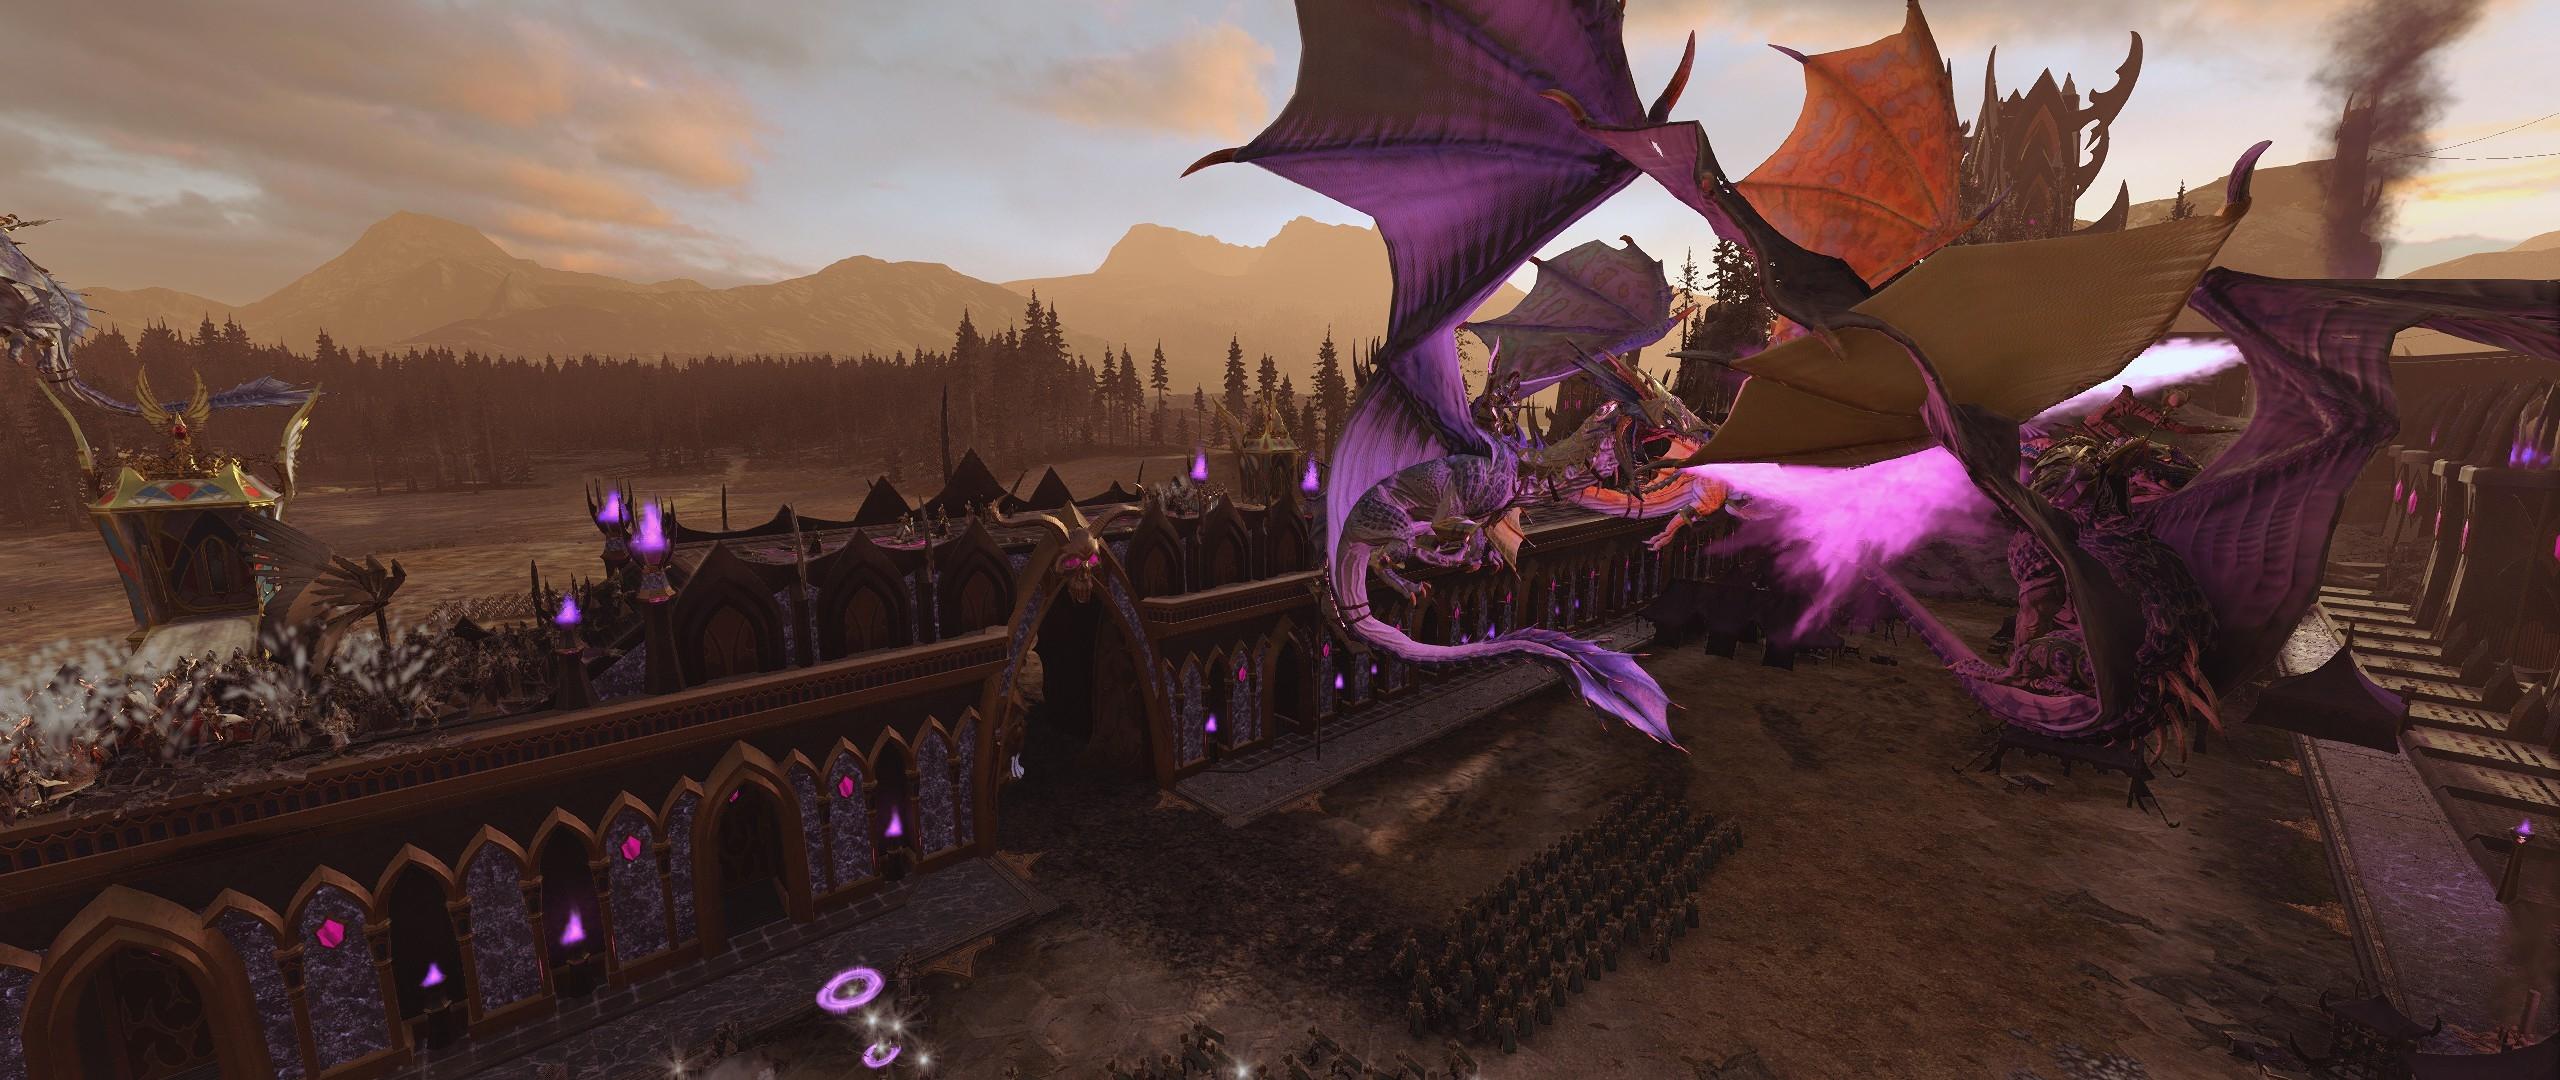 Total War: Warhammer II Review - It's Bloody Good